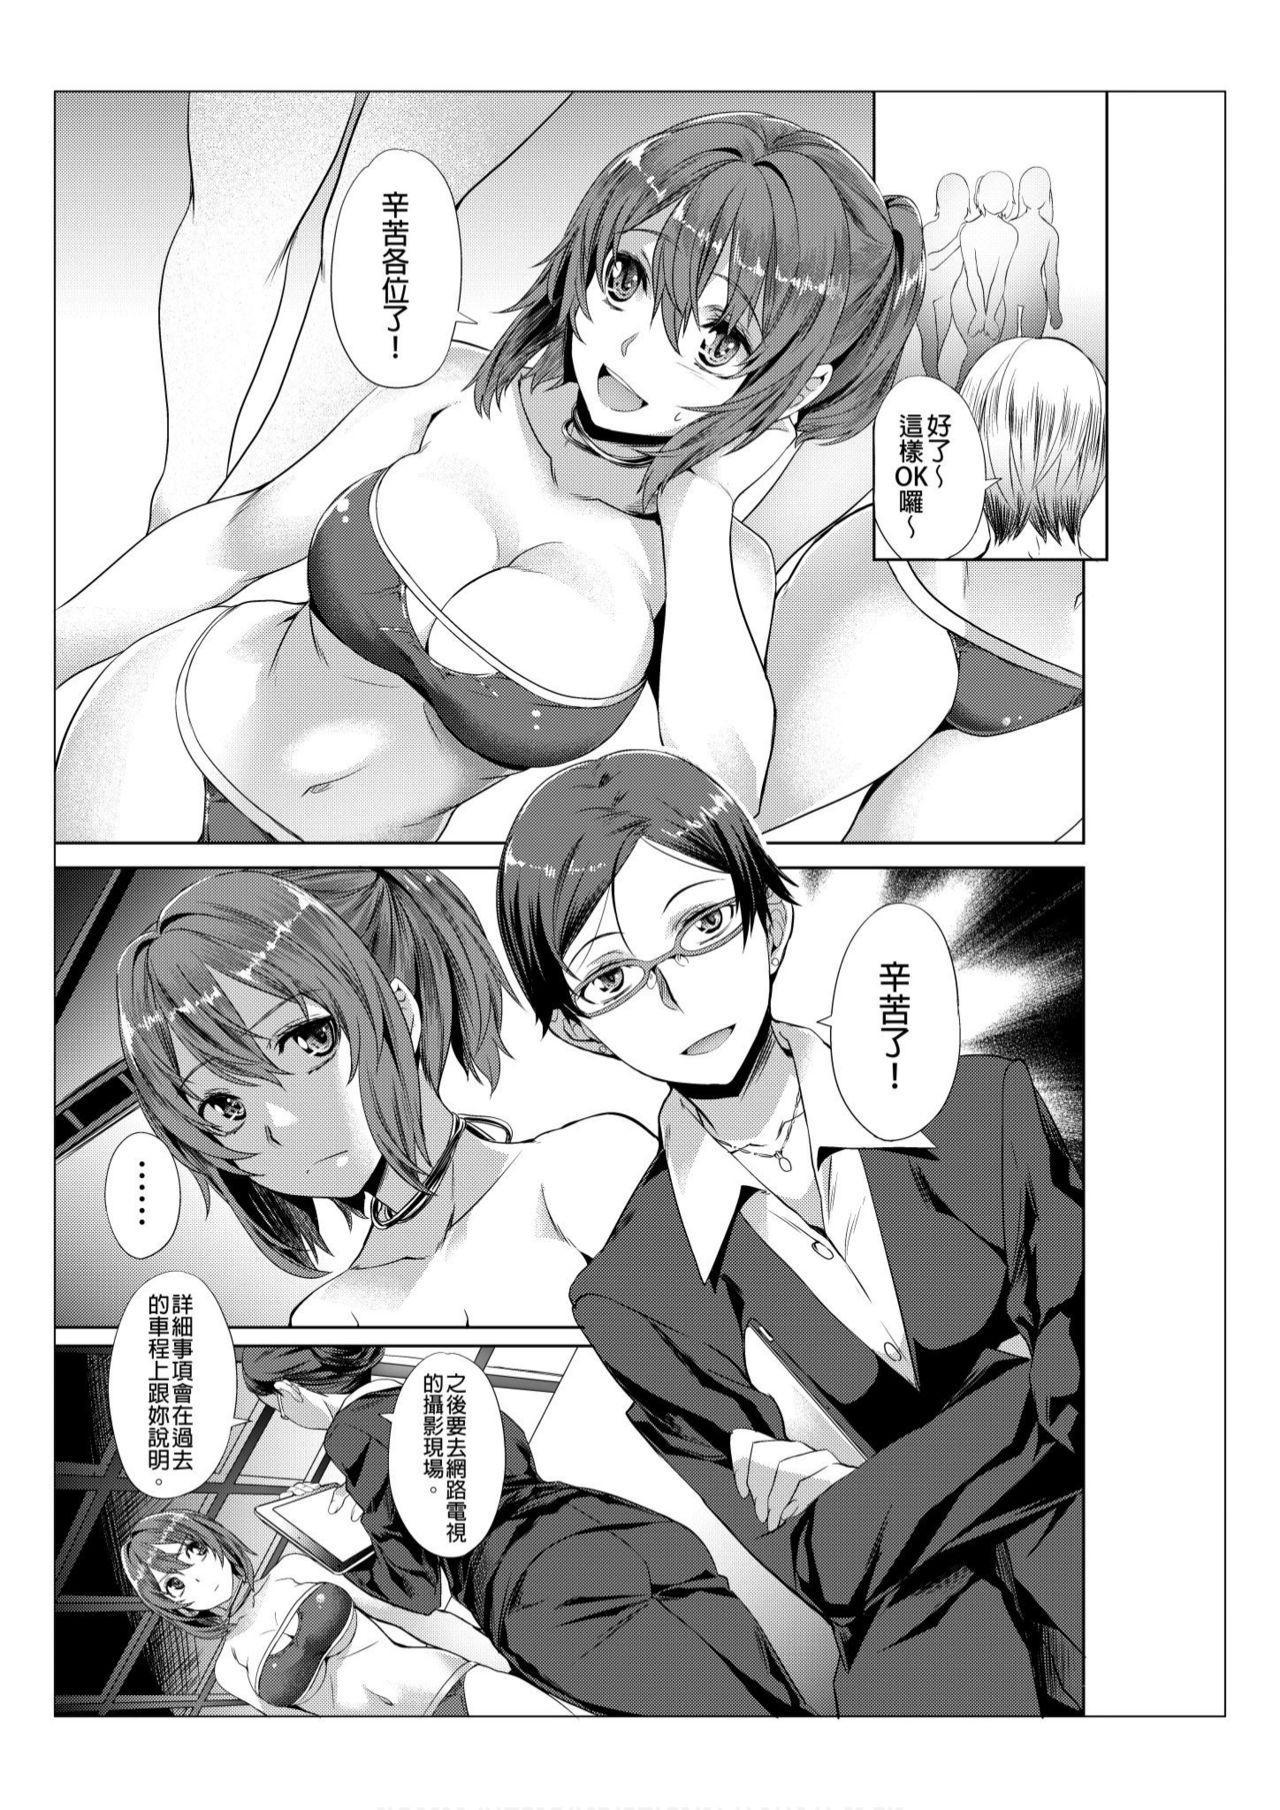 [Nagayori] Towel Ichimai de Otoko Buro.~ Shiranai Ojisan-tachi to Honiki Sex ~ | 只裹了條小毛巾就進男浴池的我。~被完全不認識的大叔們弄到高潮了~ [Chinese] [Decensored] 59